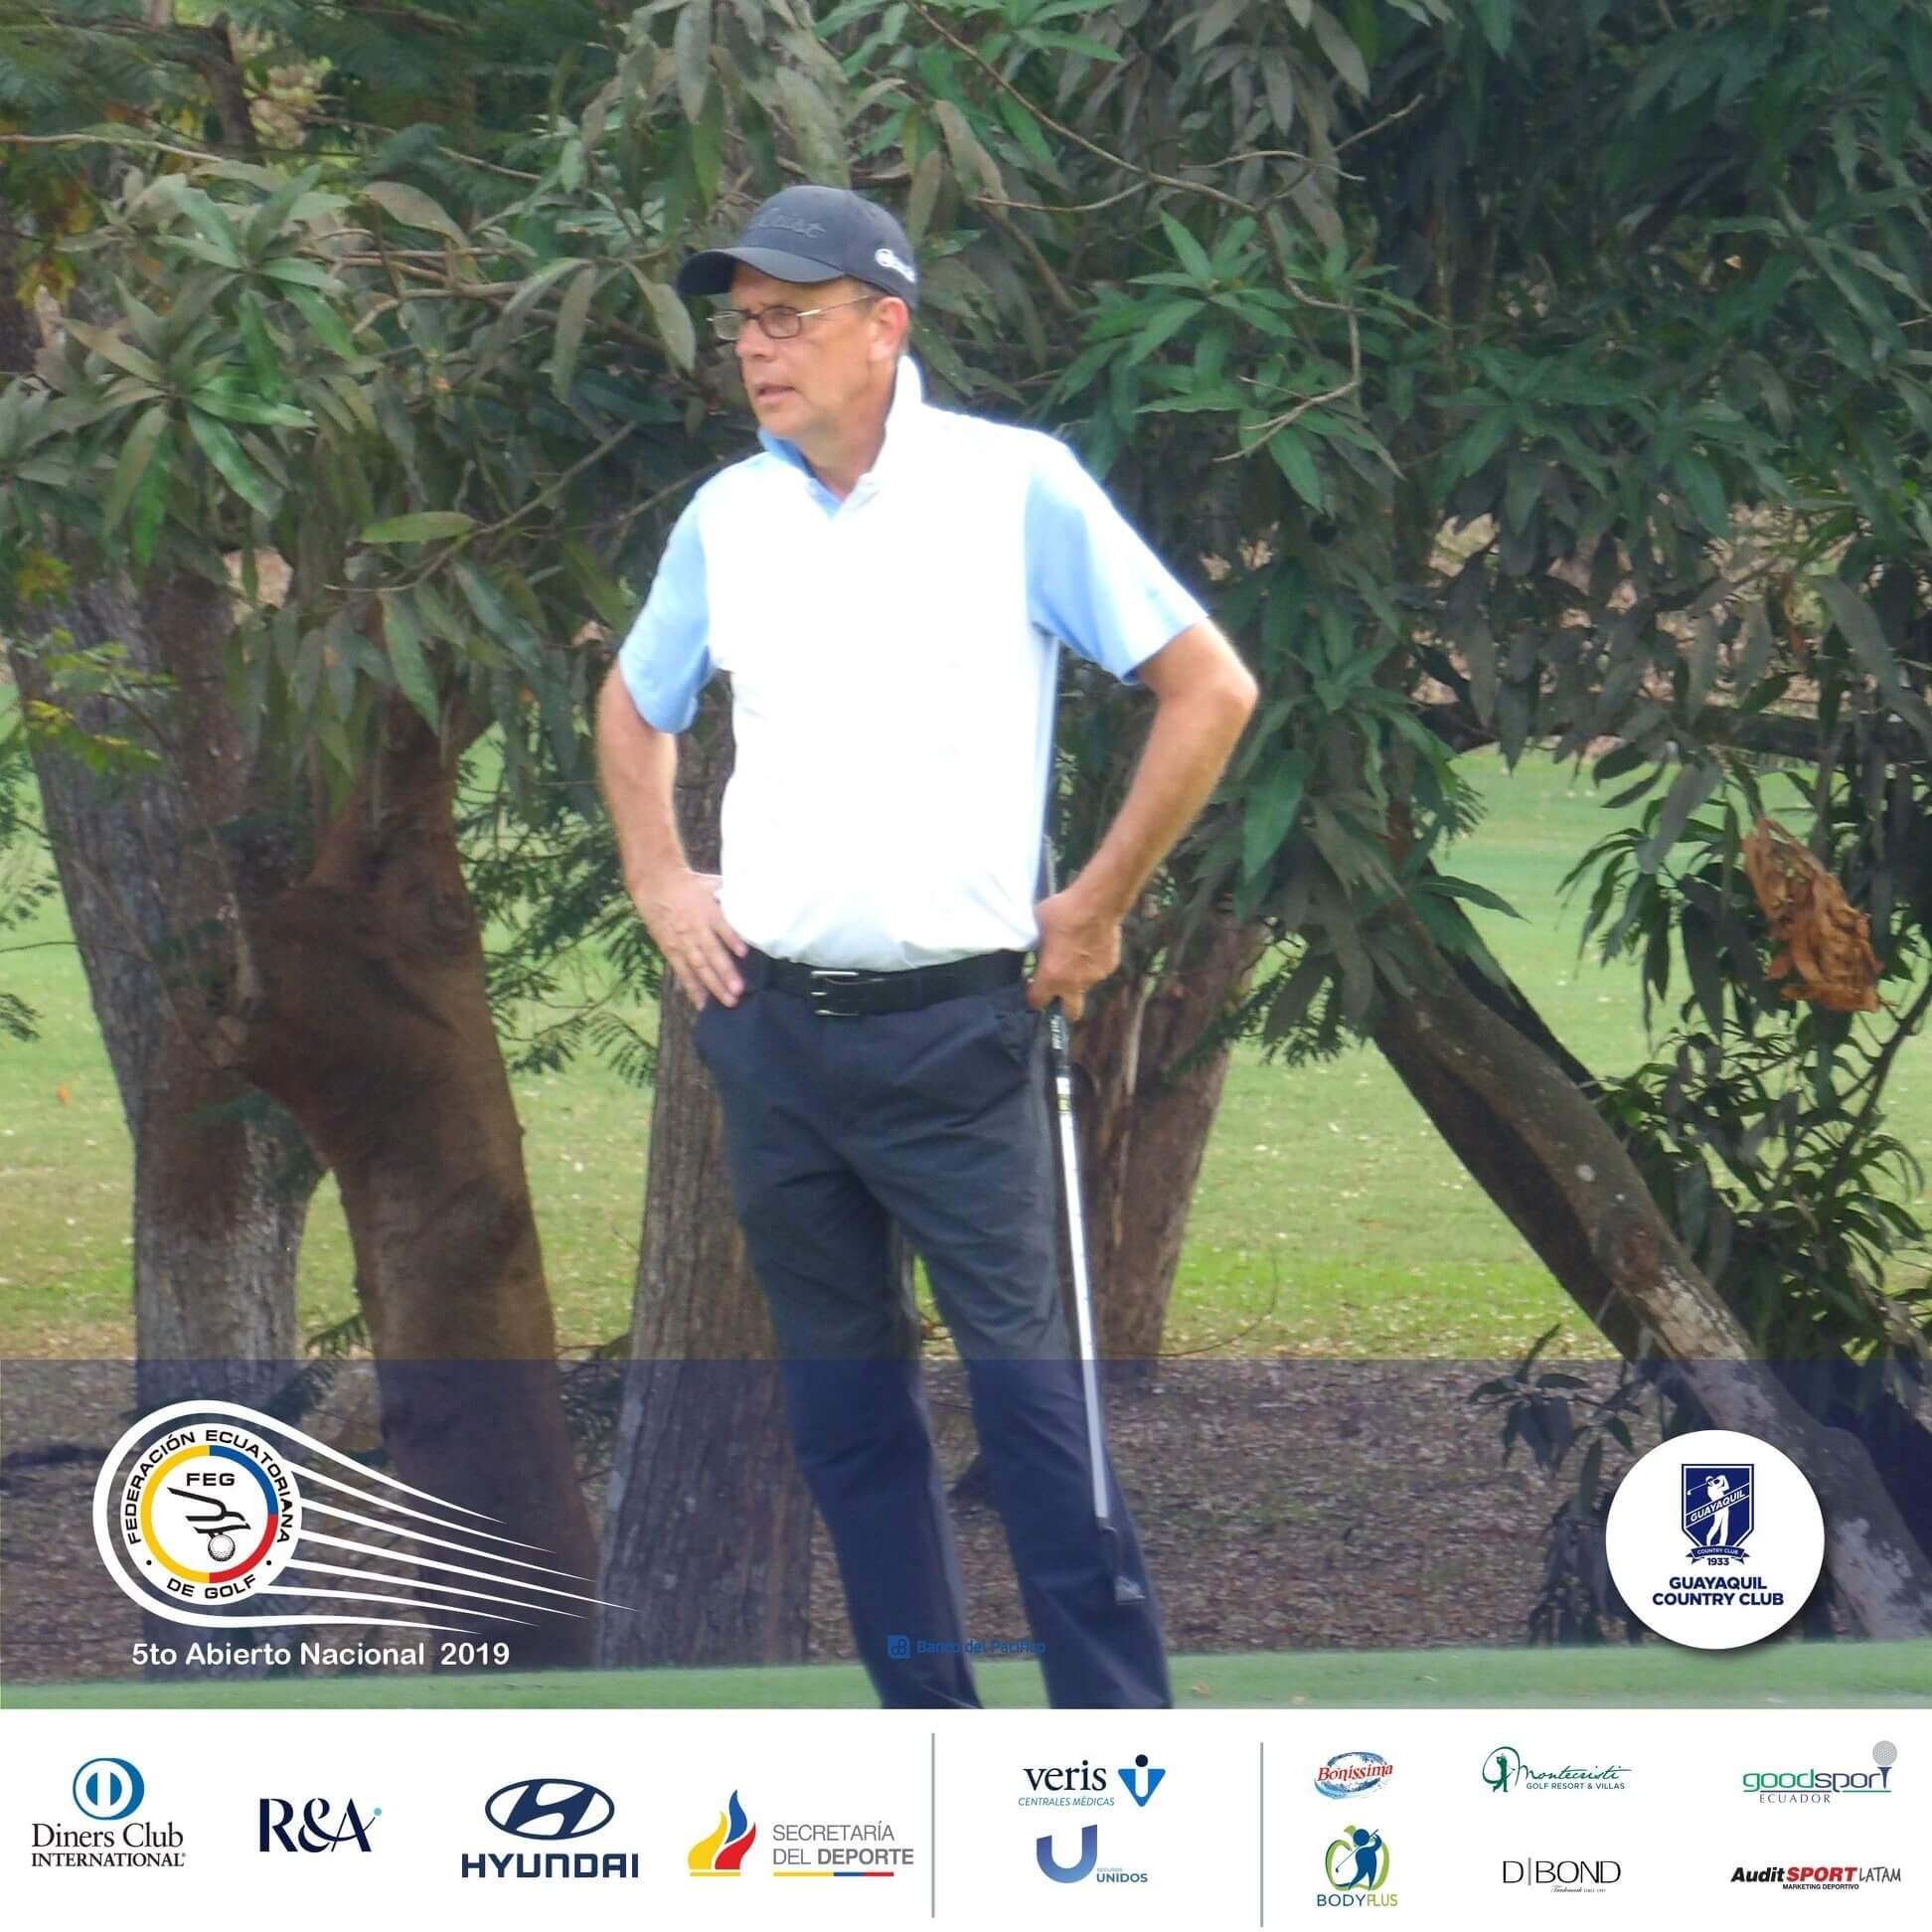 The Ecuadorian National Open of The Federacion Ecuatoriana de Golf in GCC Guayaquil Country Club 2019 | Eco. Lassi Pensikkala